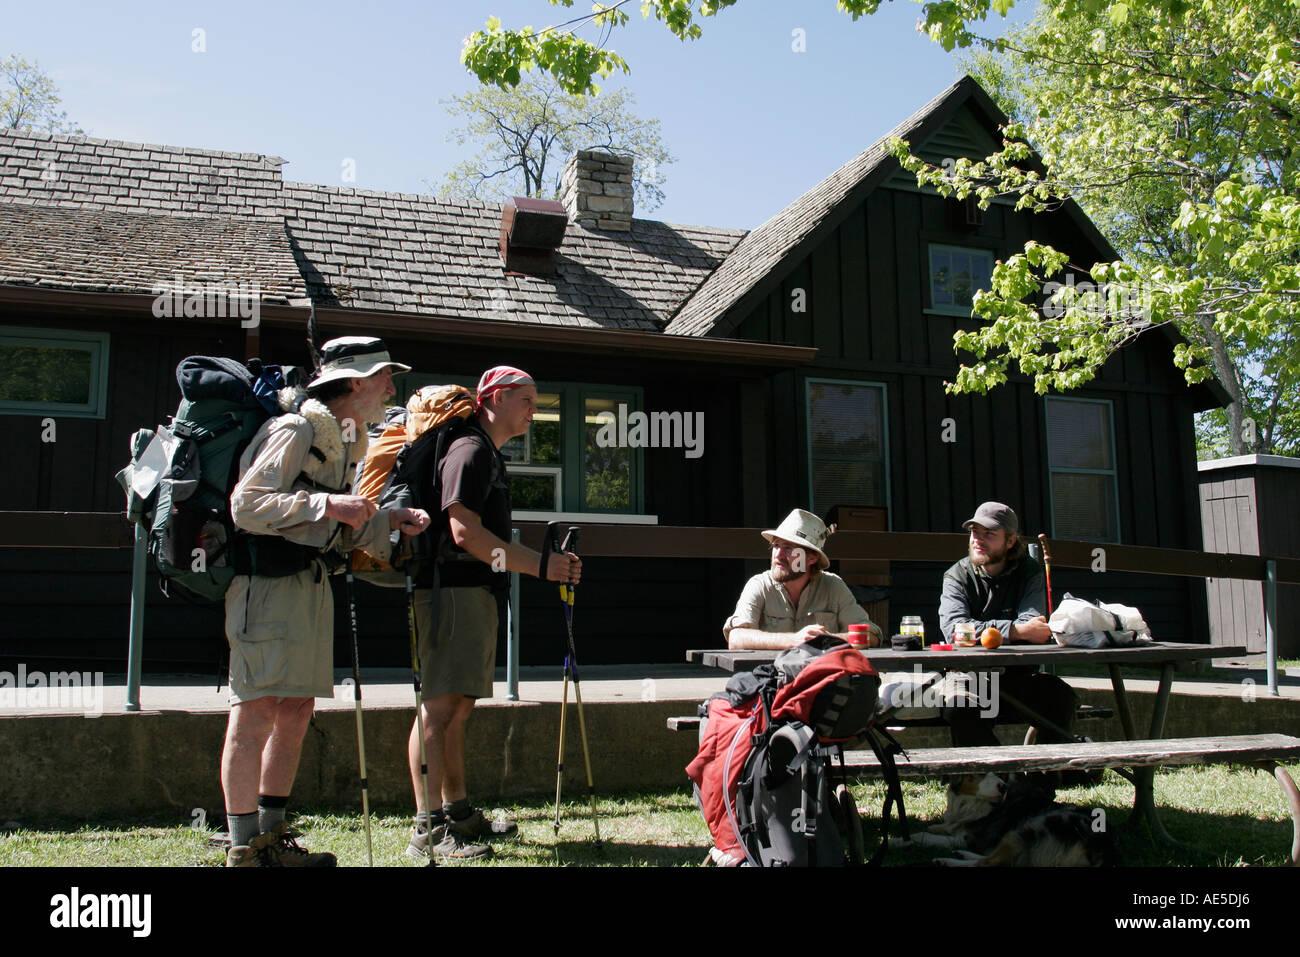 Virginia VA South Shenandoah National Park mile marker 24 Elkwallow camp store hikers eating American Americans VA060524021 Stock Photo